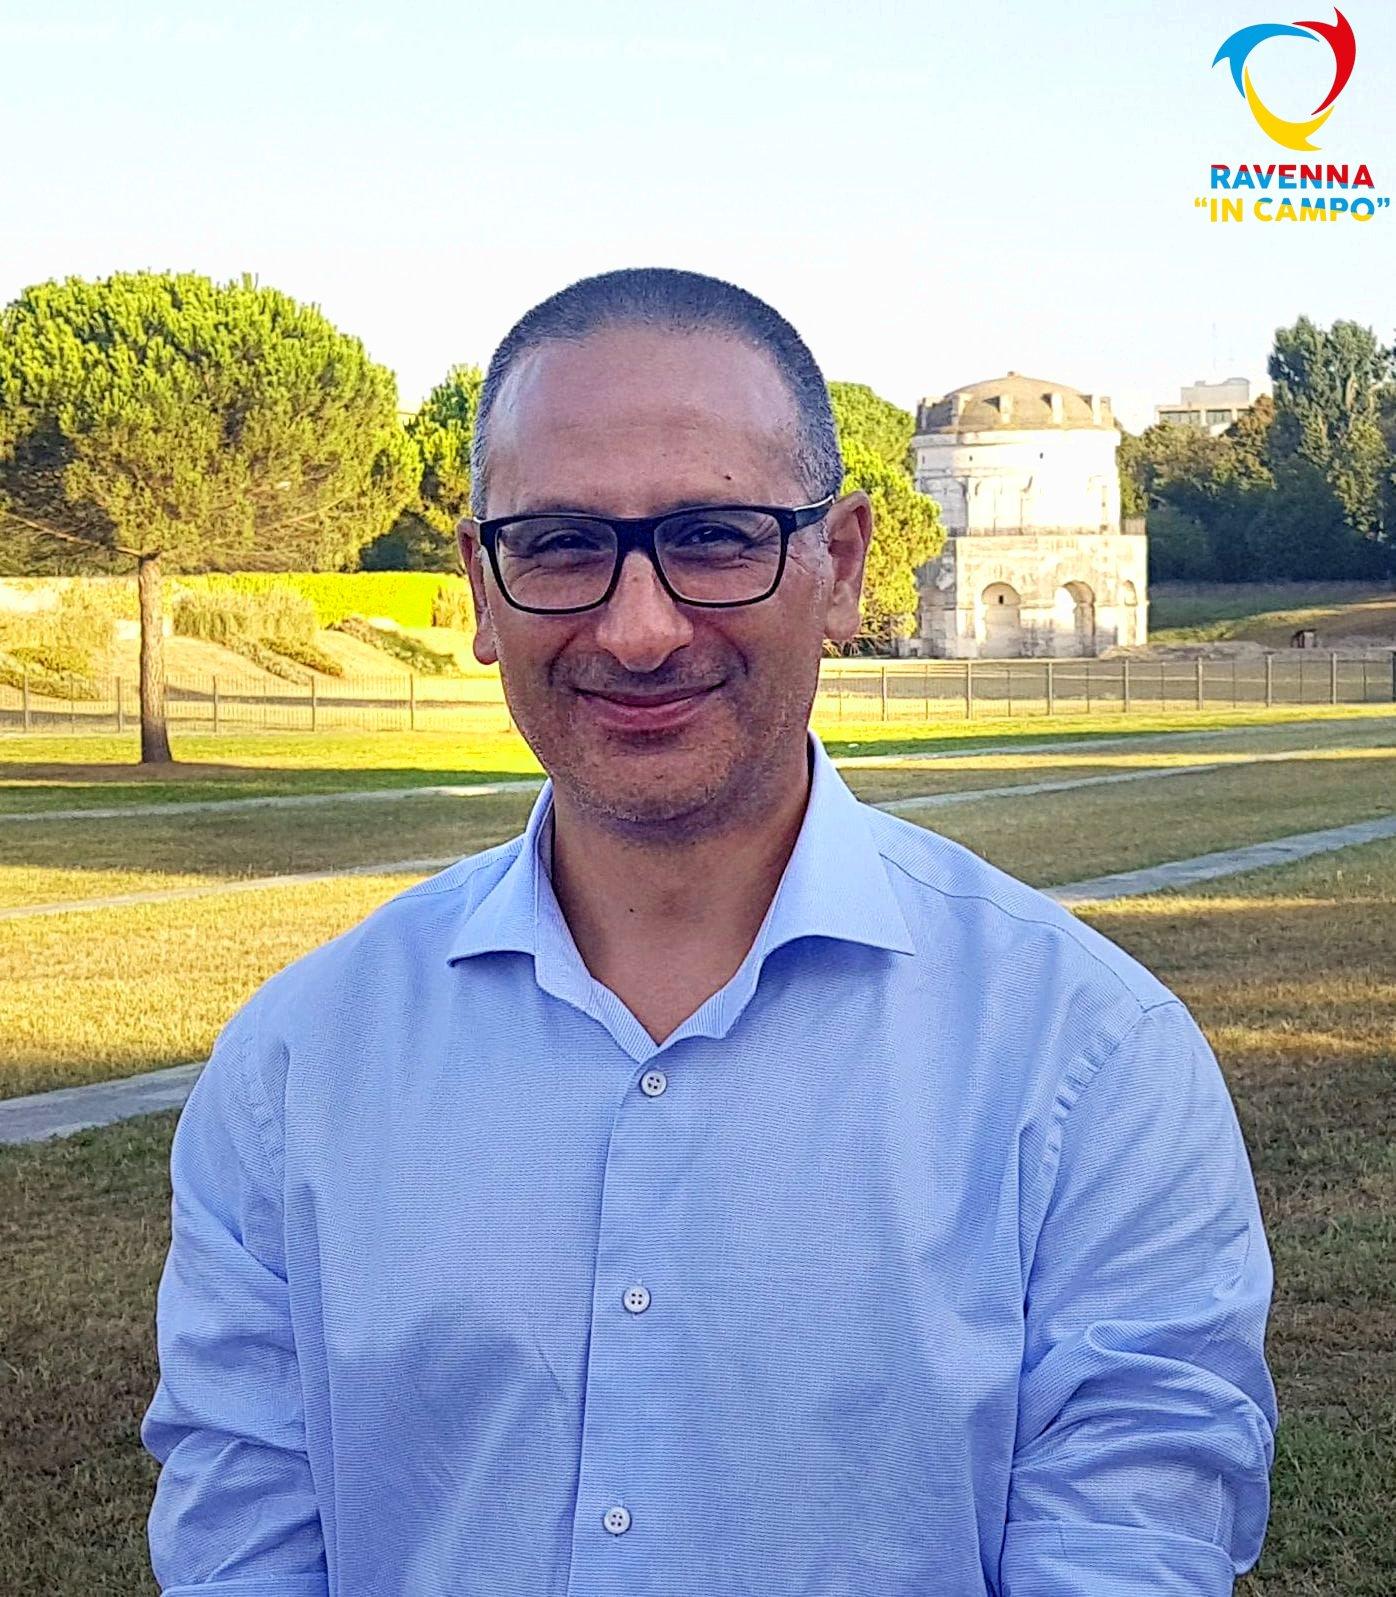 Elezioni amministrative a Ravenna